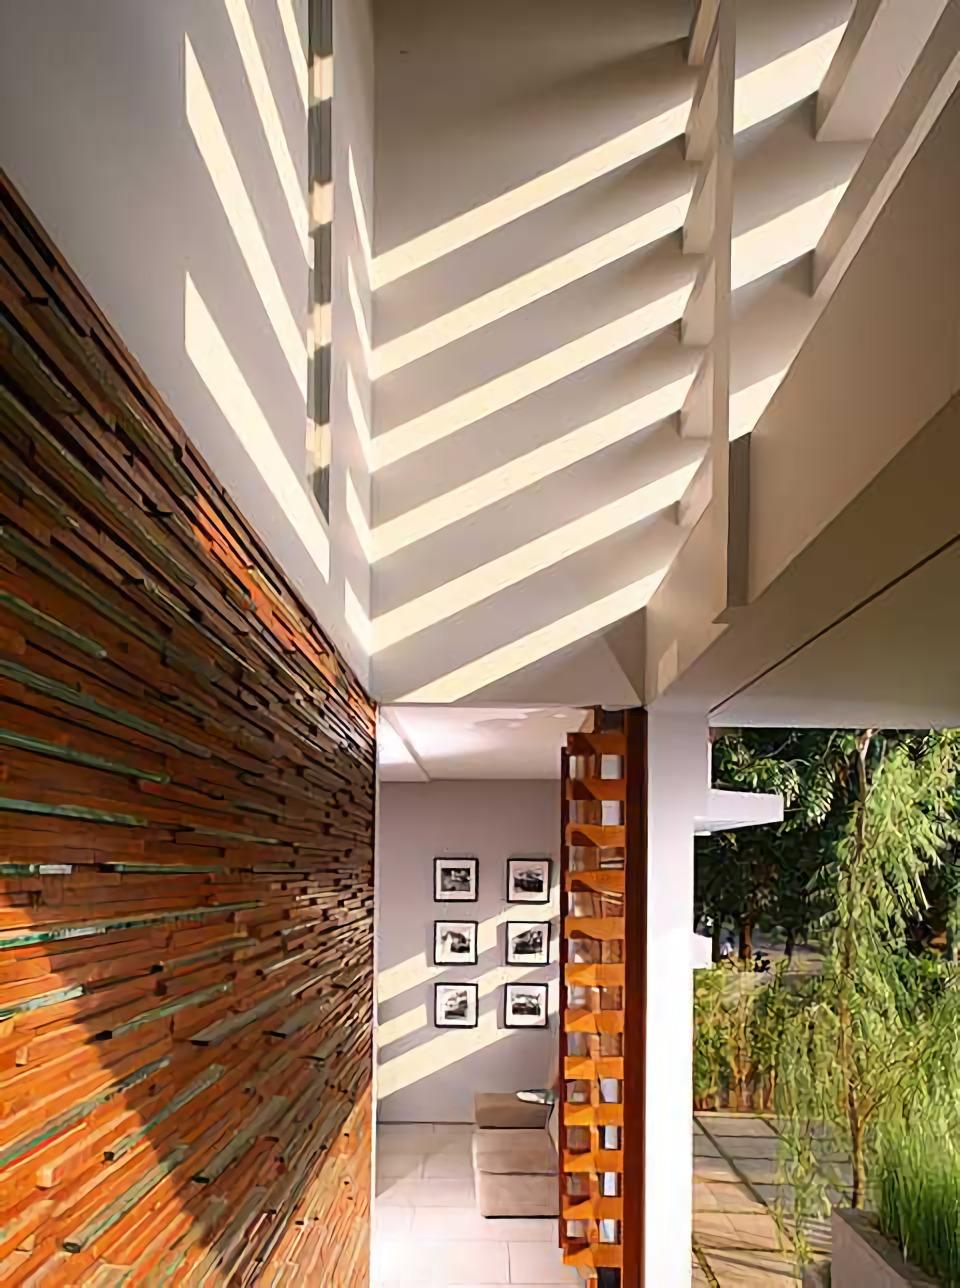 2 House karya HerryJ Architects tahun 2005 (Sumber: arsitag.com)